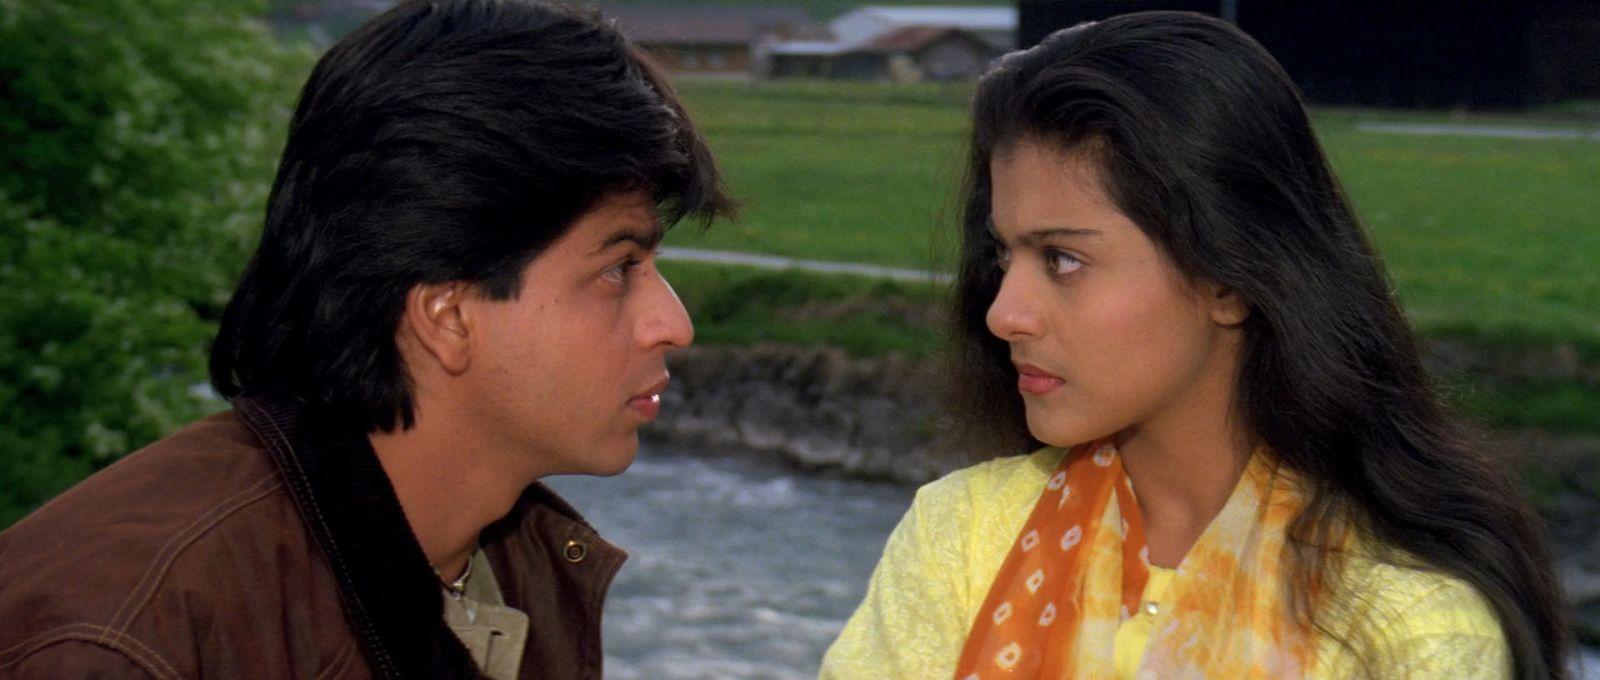 Dilwale-Dulhania-Le-Jayenge-Shahrukh-Khan-and-Kajol.jpg ...